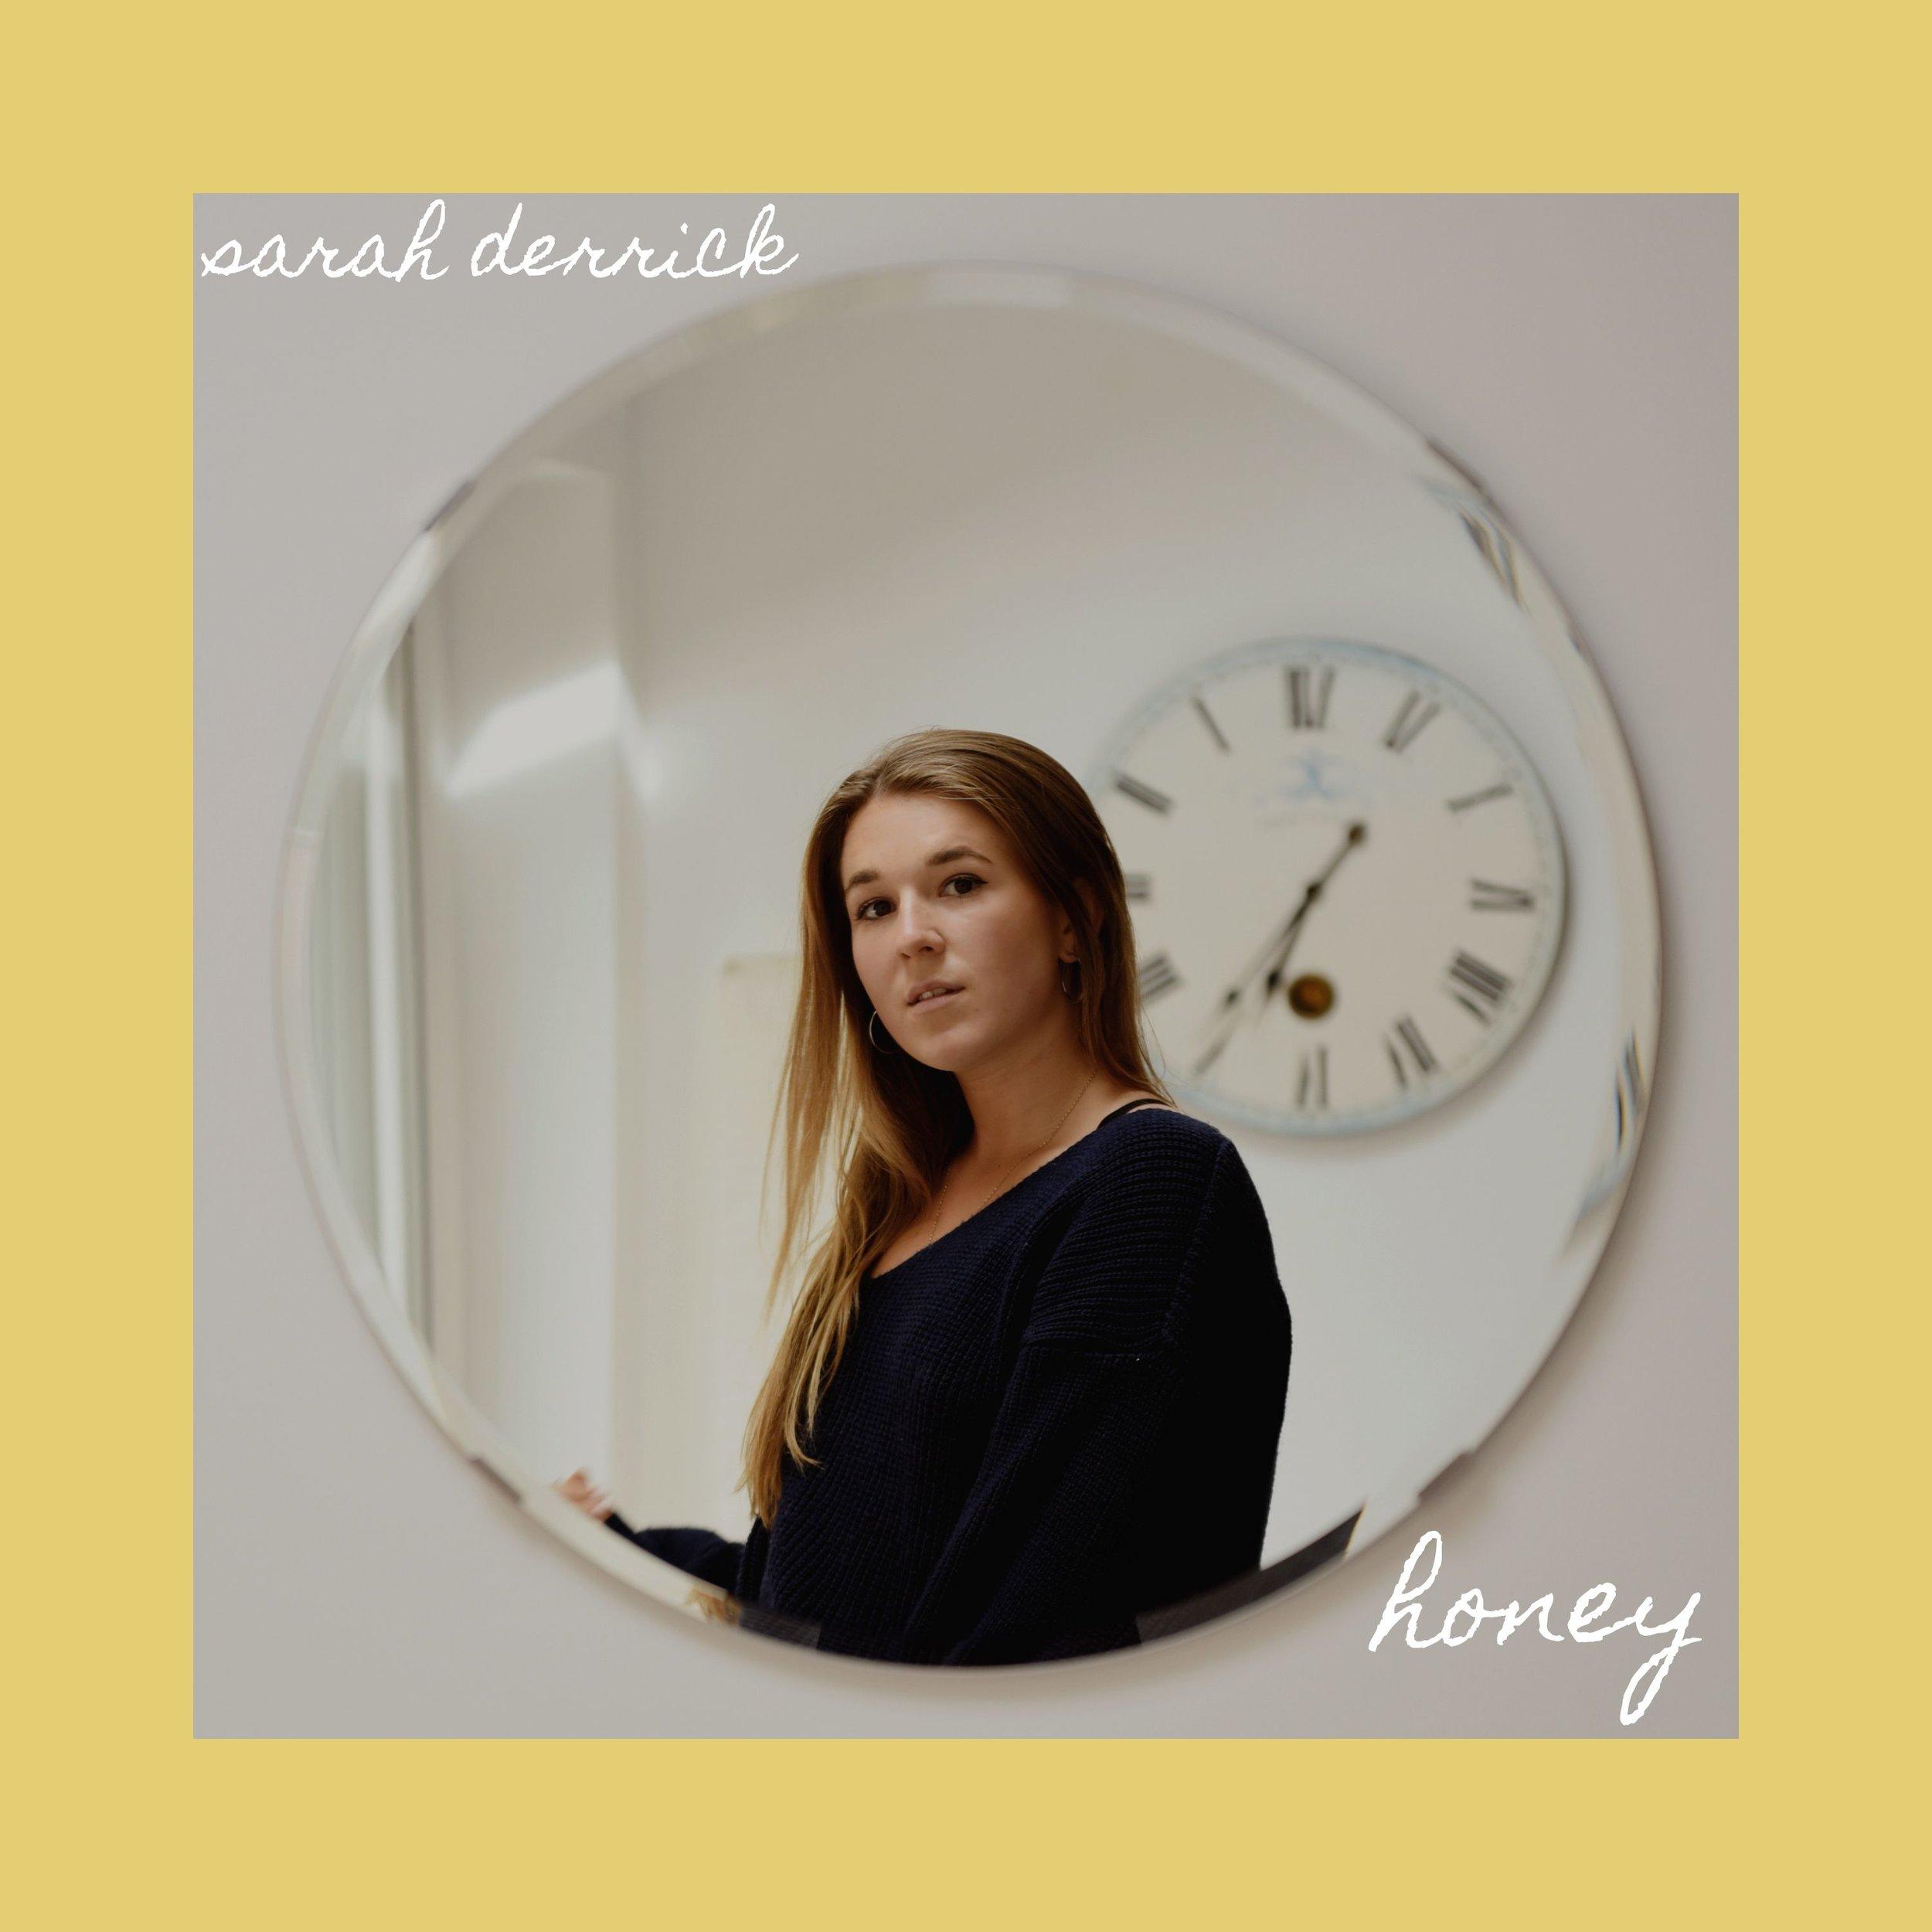 Honey Sarah Derrick